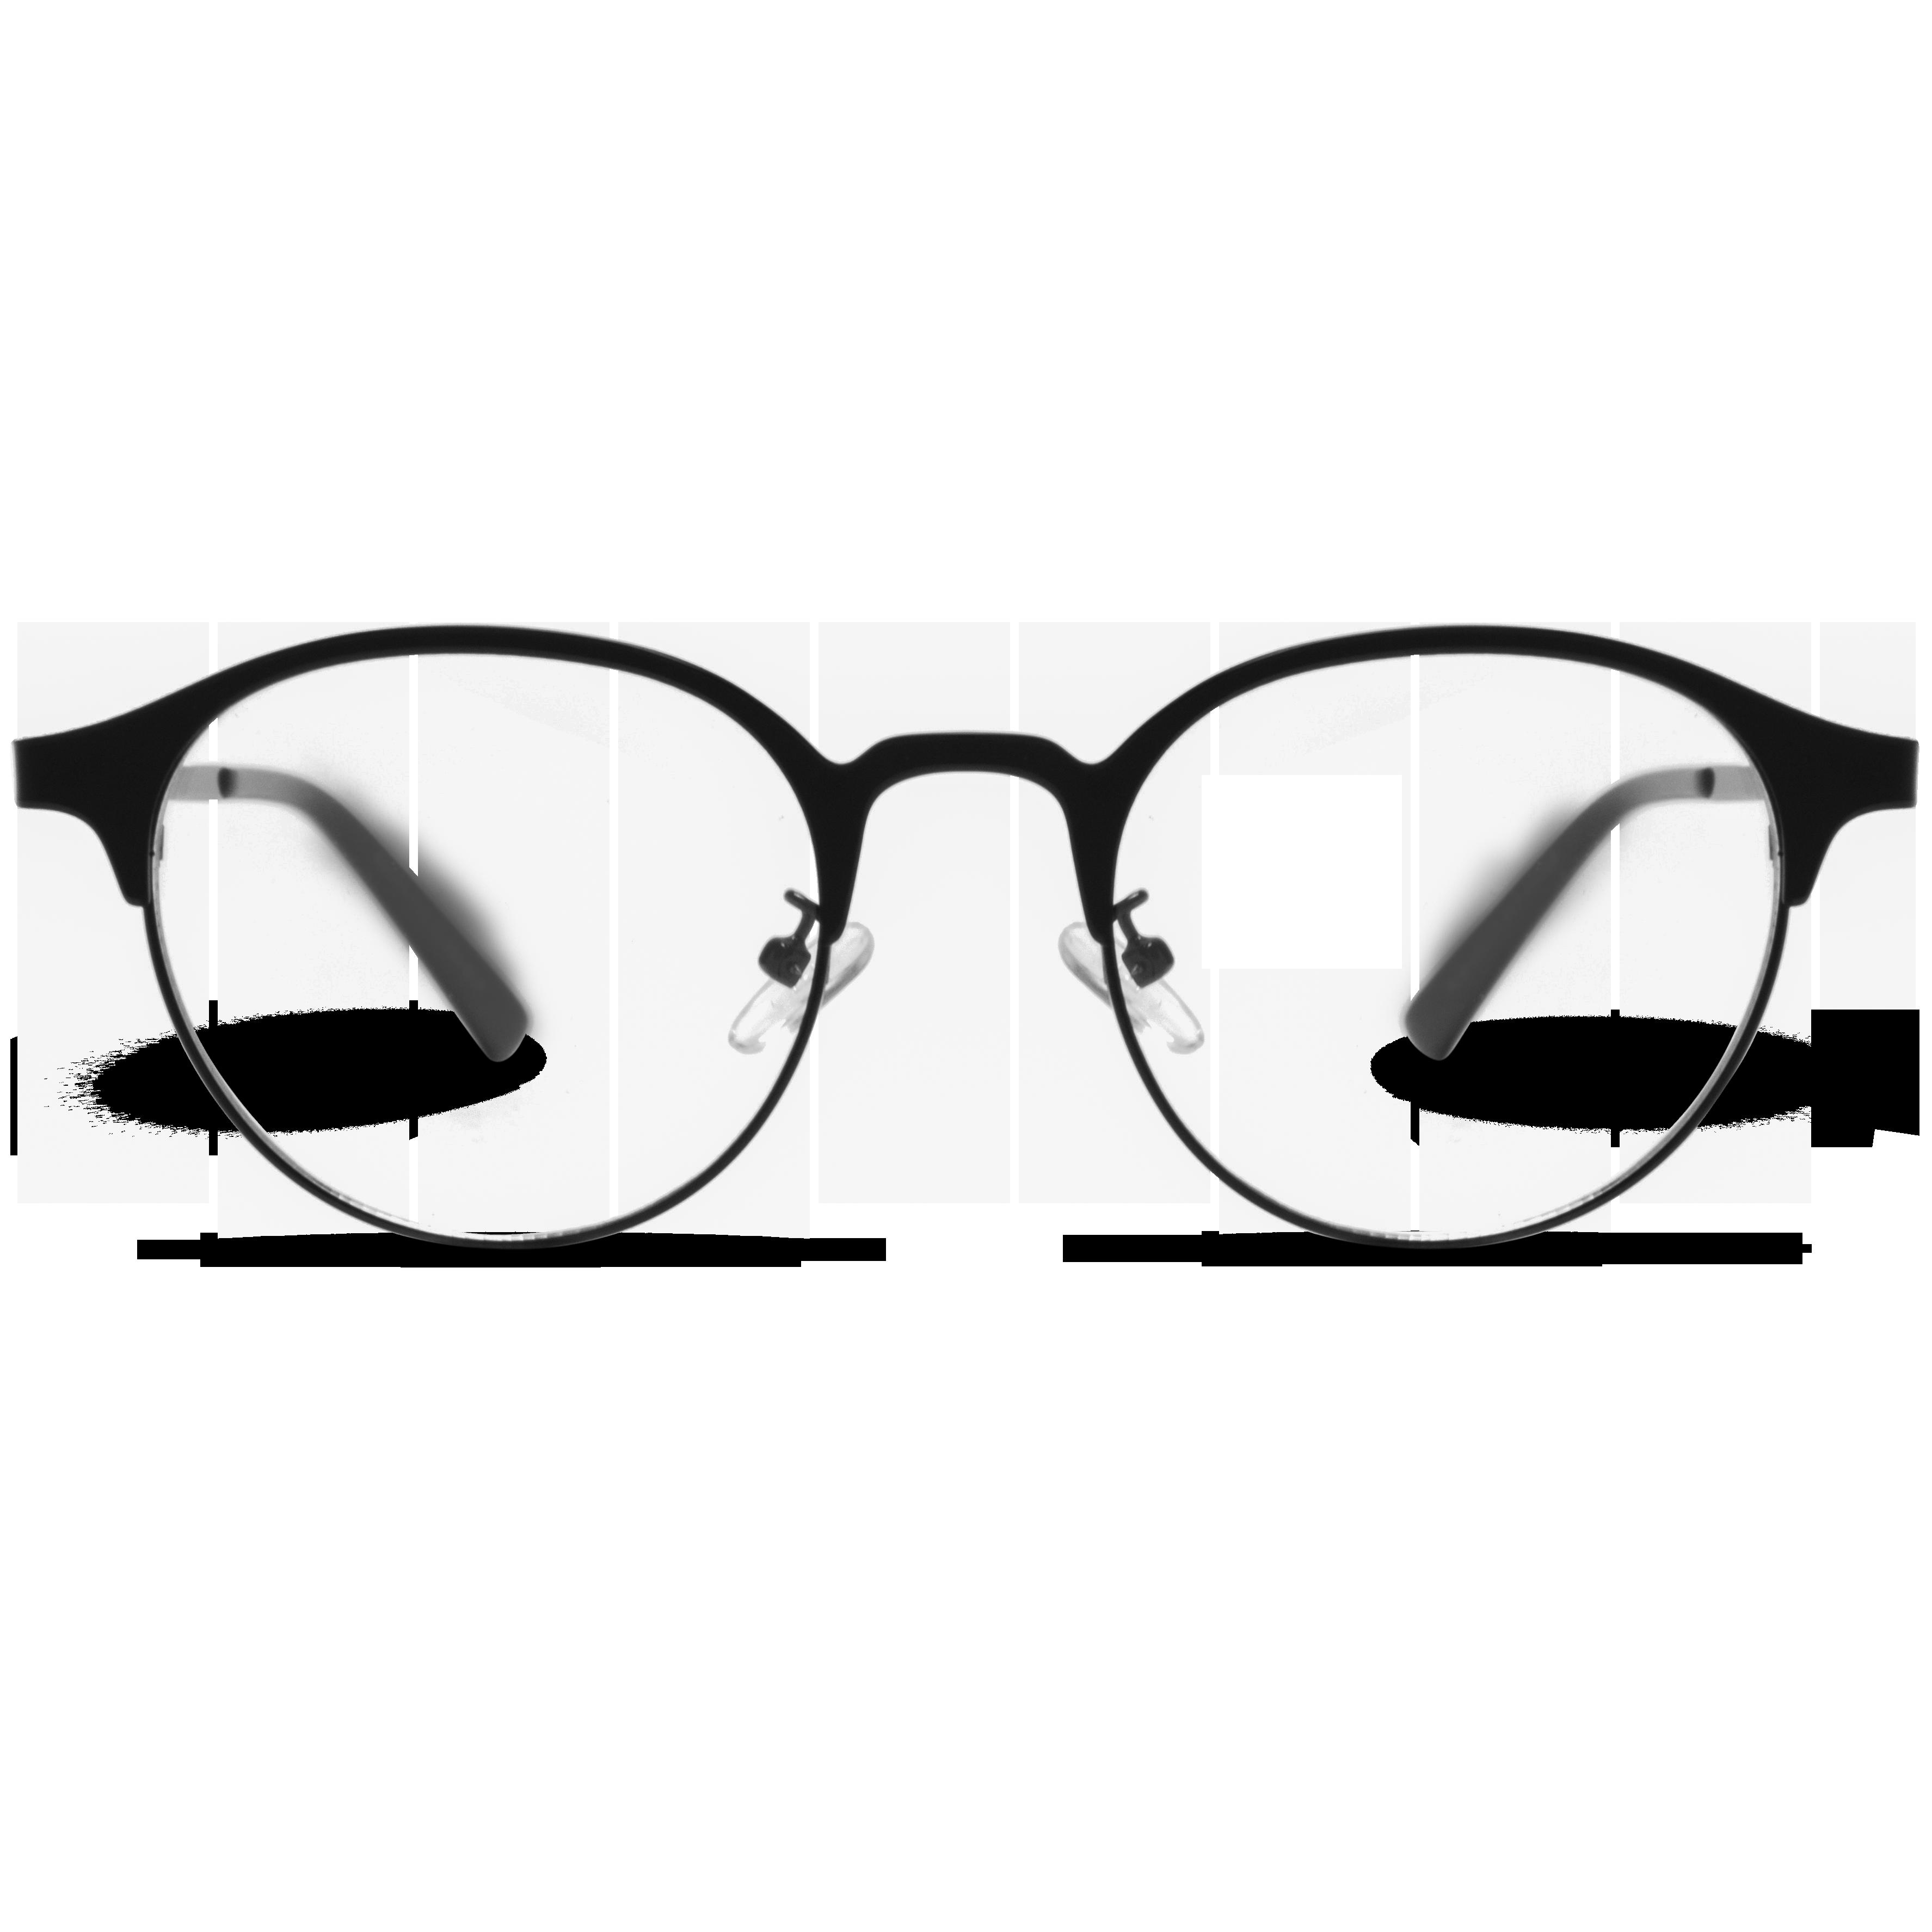 Ethel Retro Round Metal Hippie Sunglasses John Lennon Inspired Hippie Sunglasses Round Sunglasses Vintage Circle Sunglasses Hippie